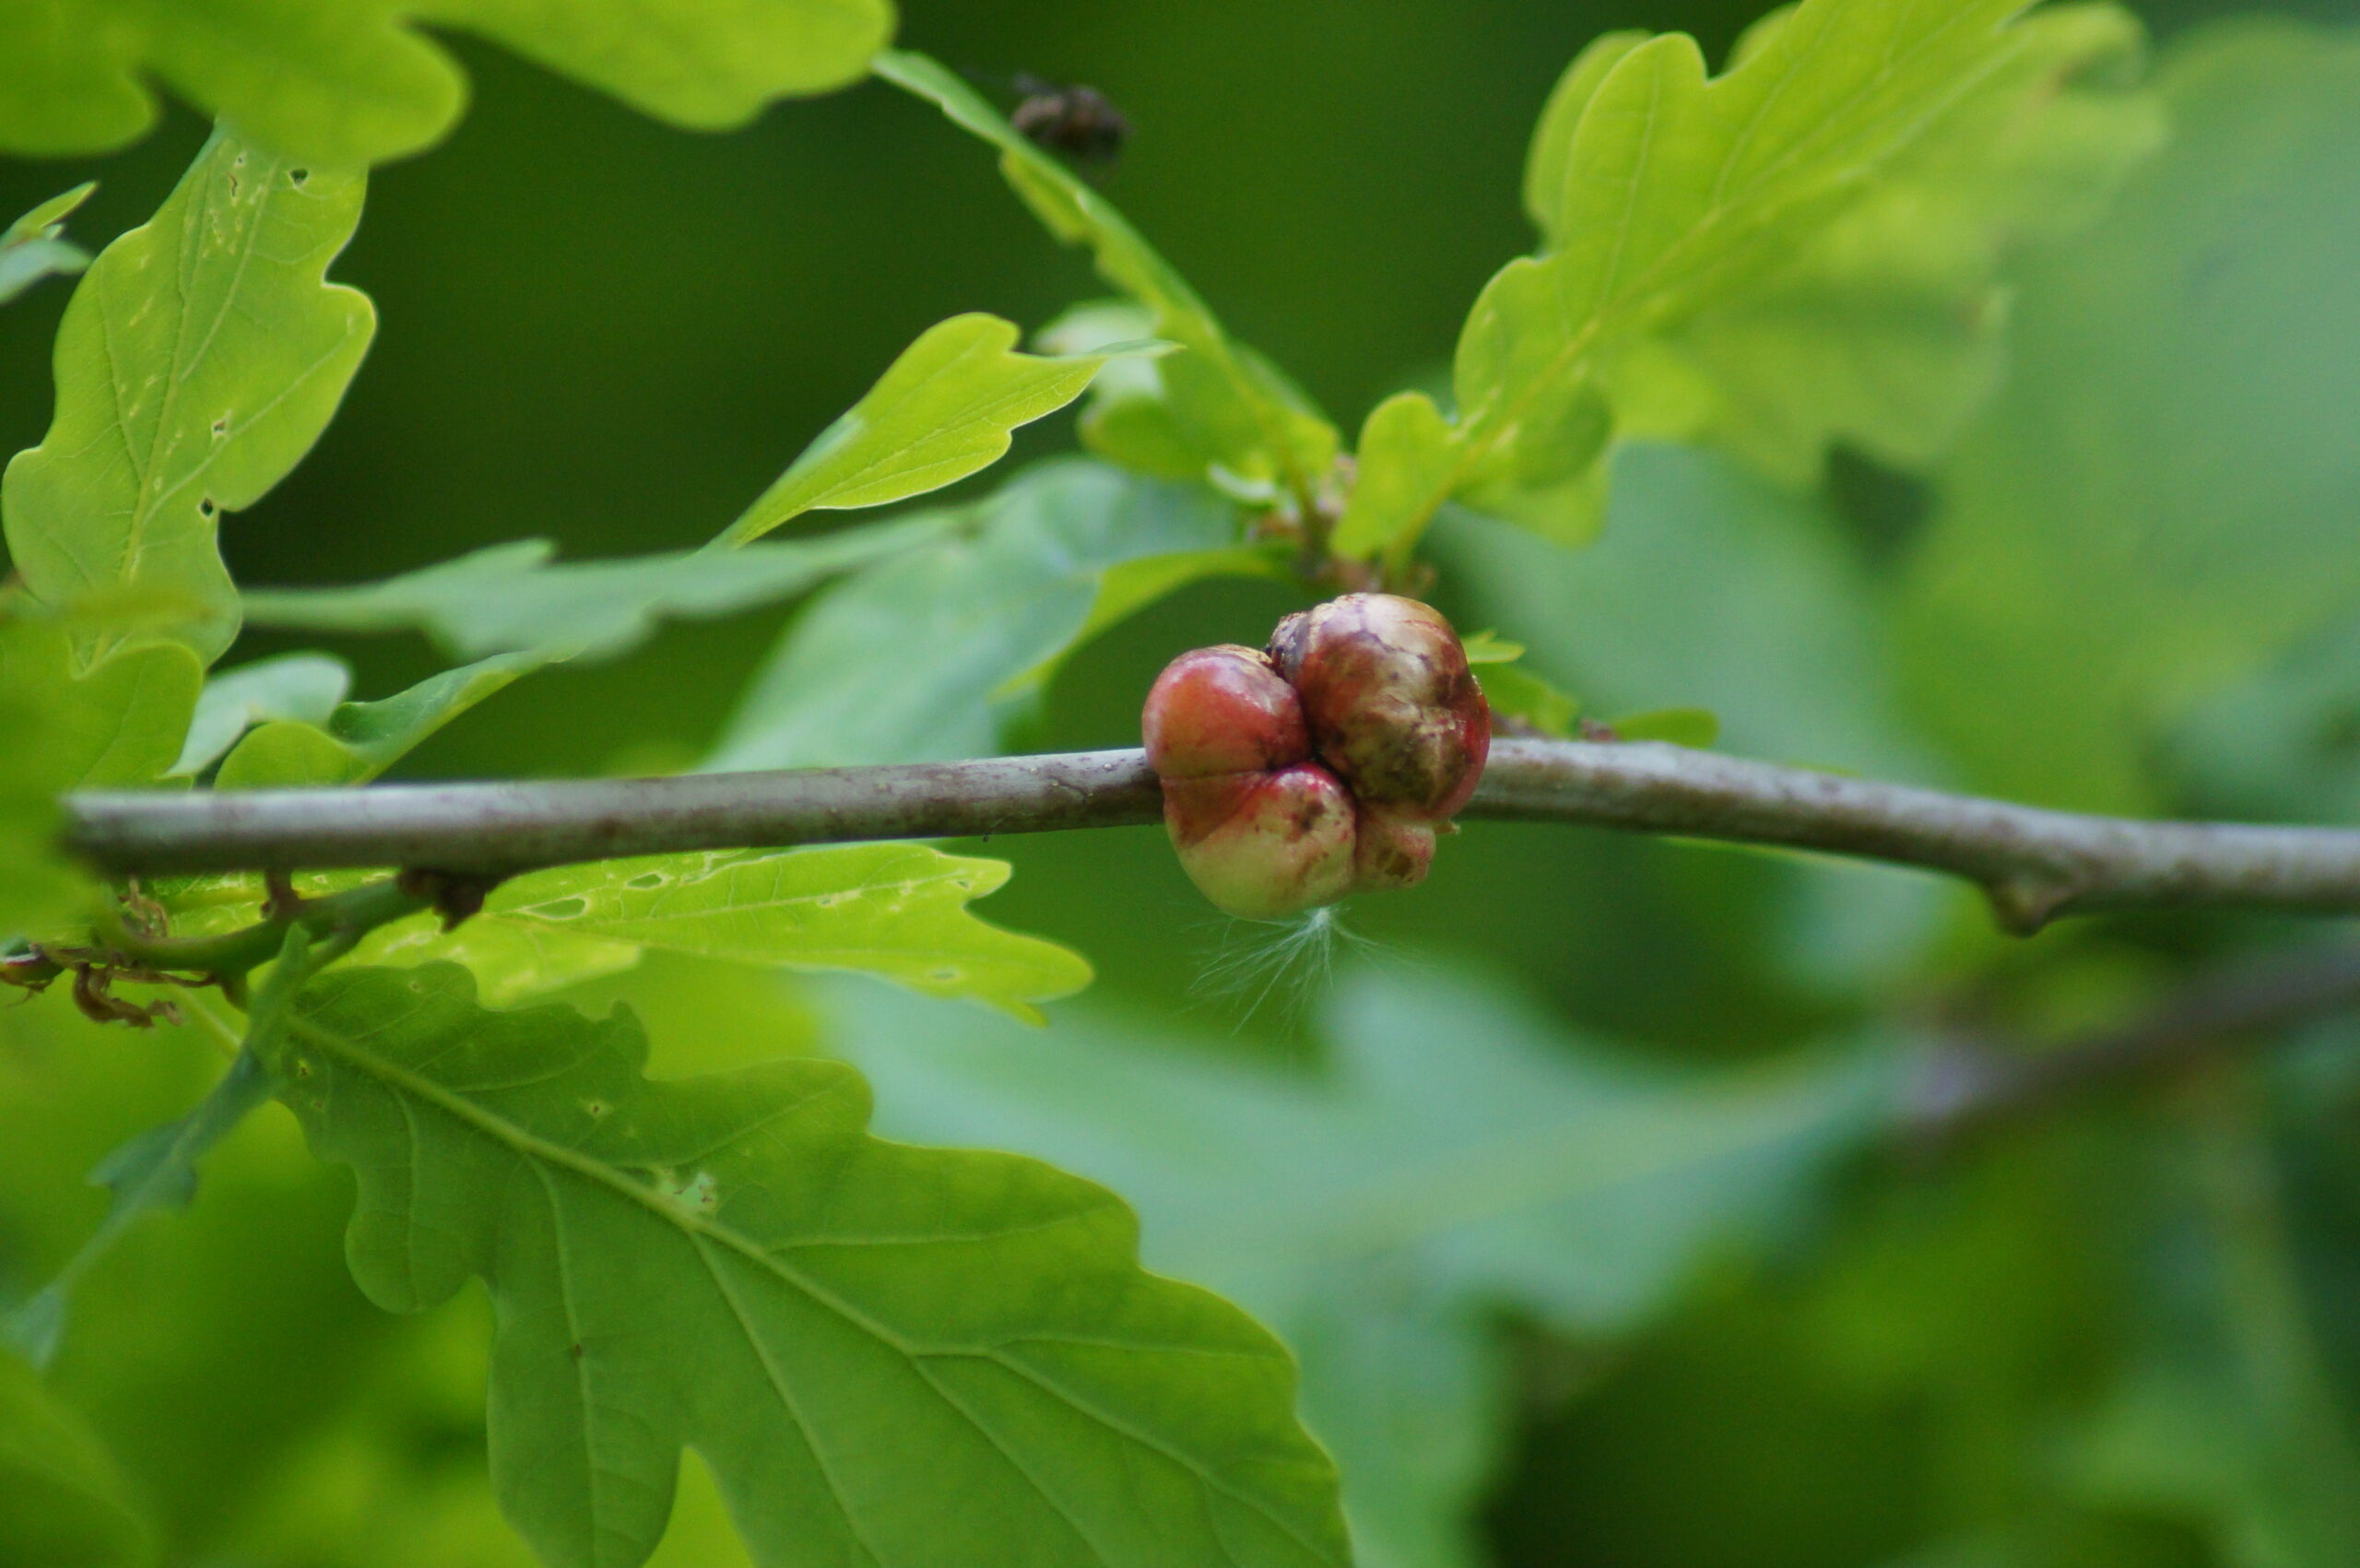 'Oak apple' - gall wasp